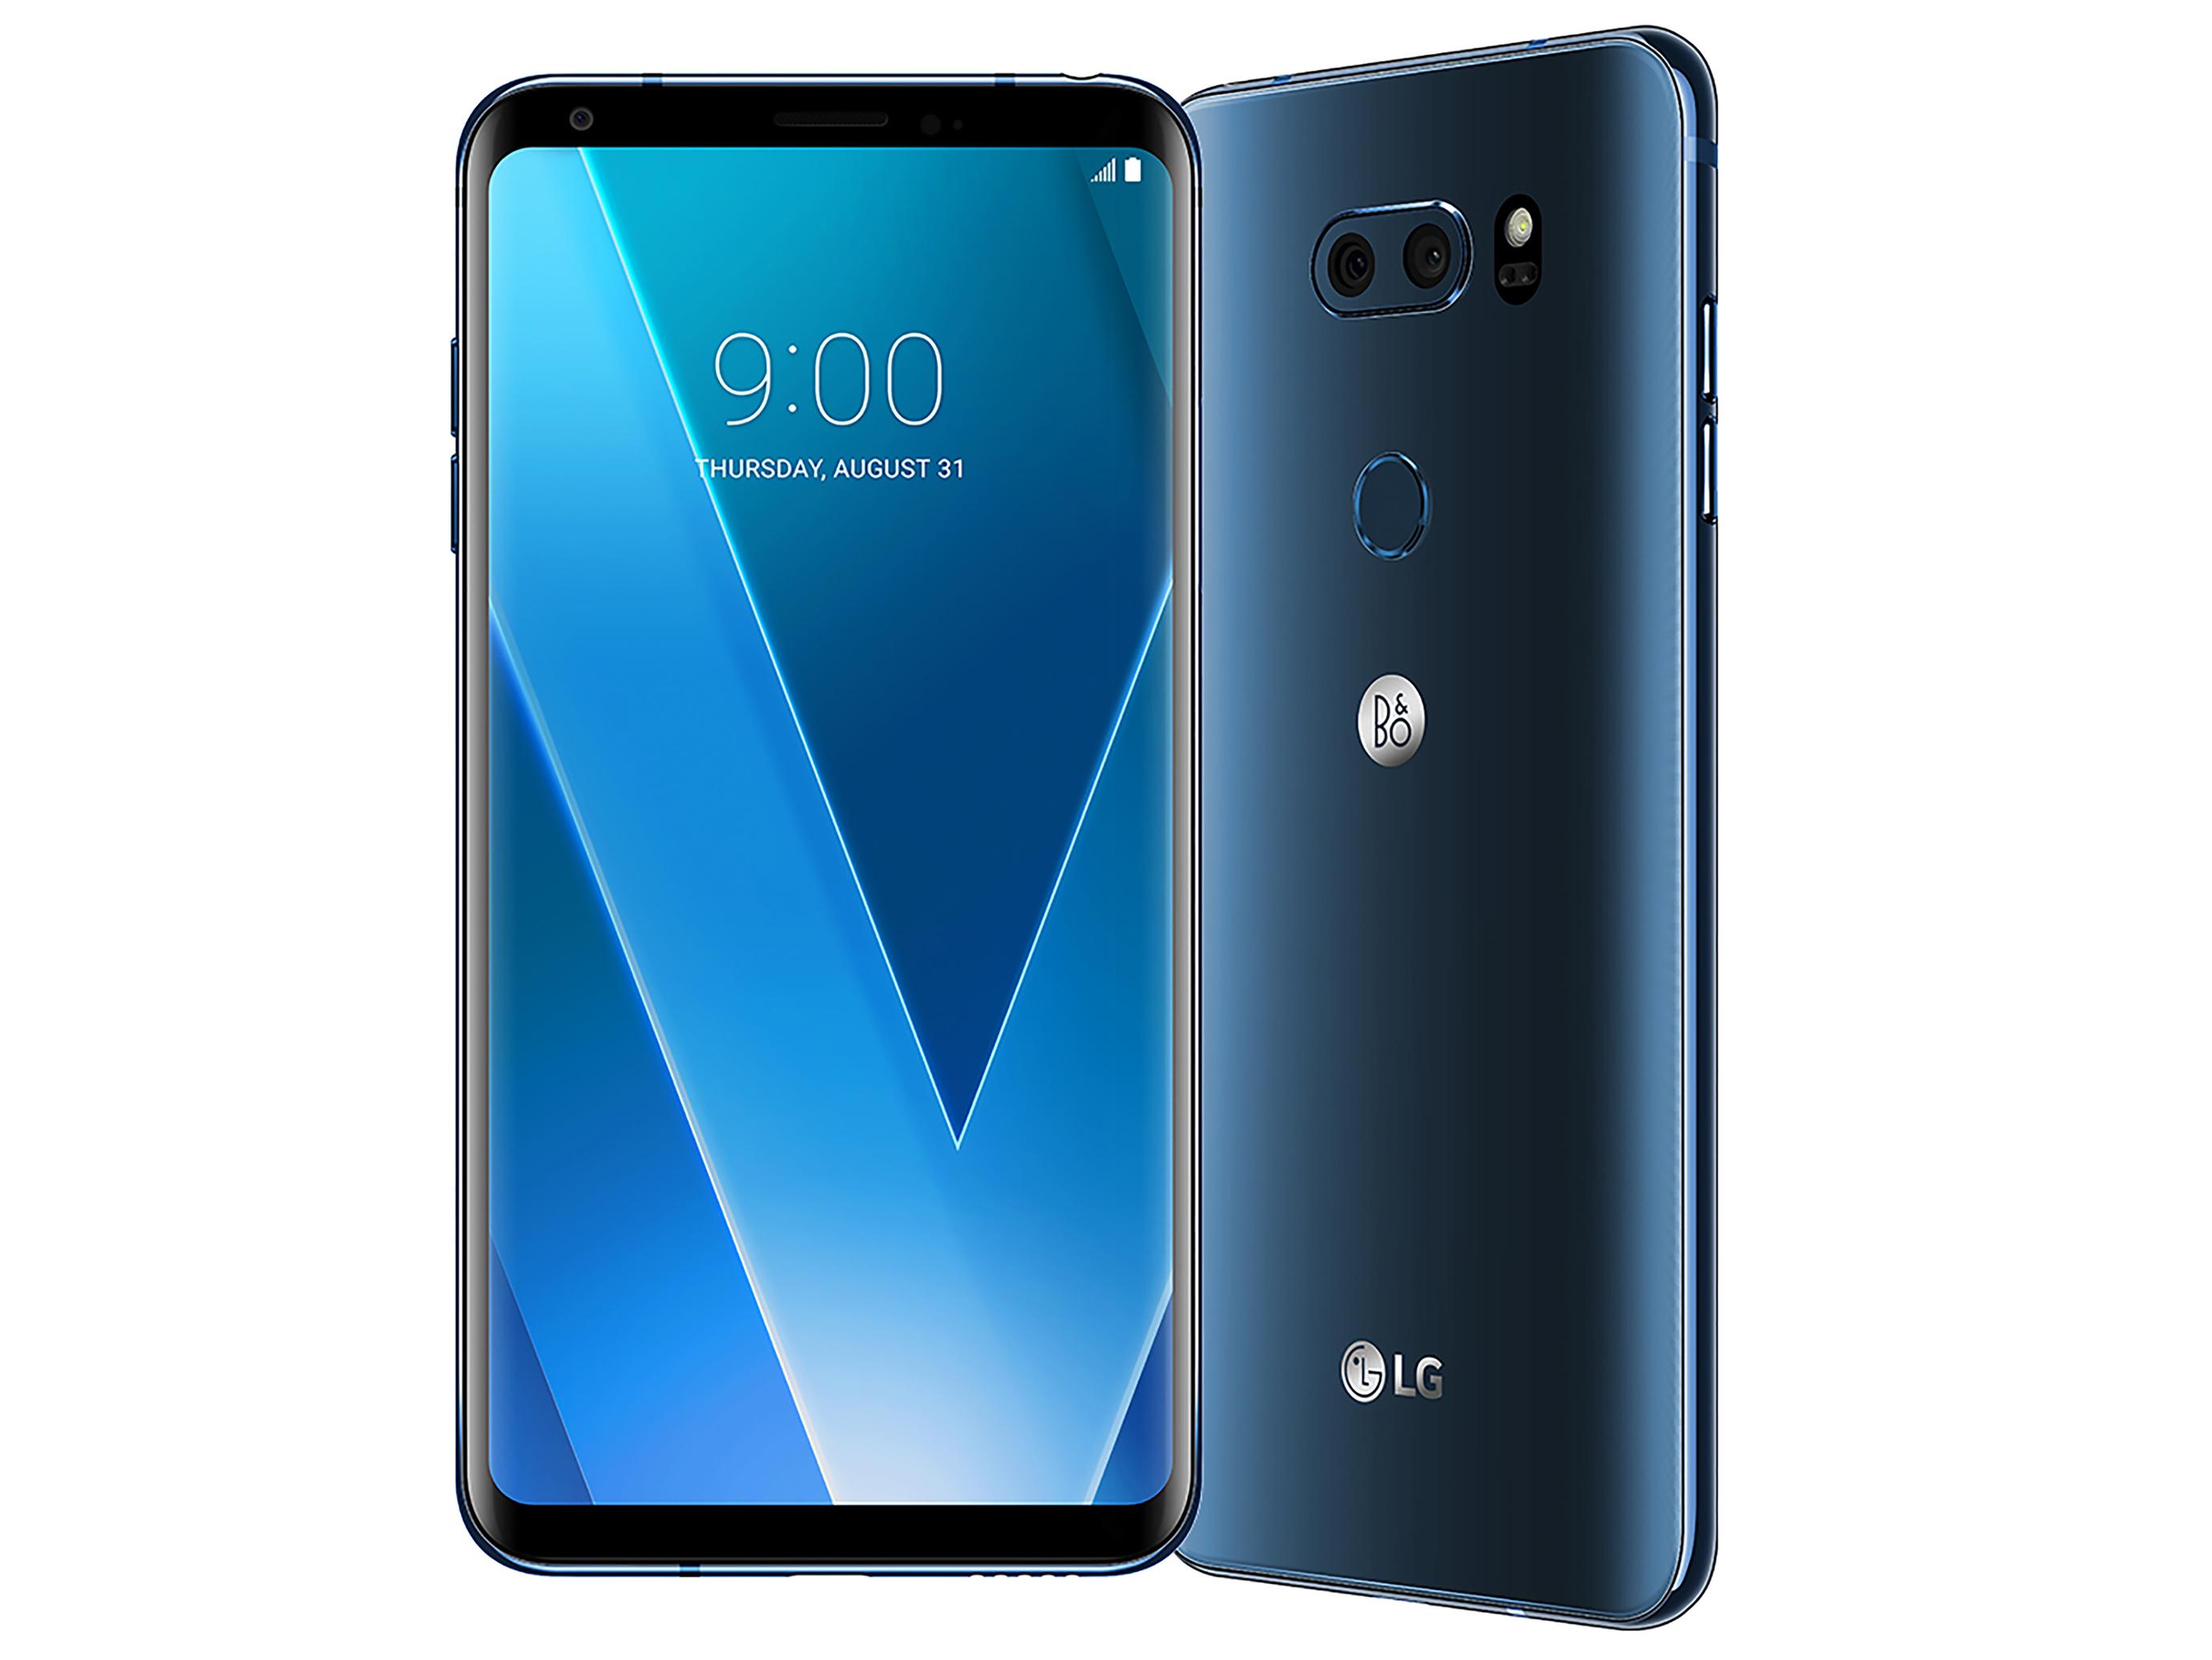 LG V30 Smartphone Review - NotebookCheck net Reviews